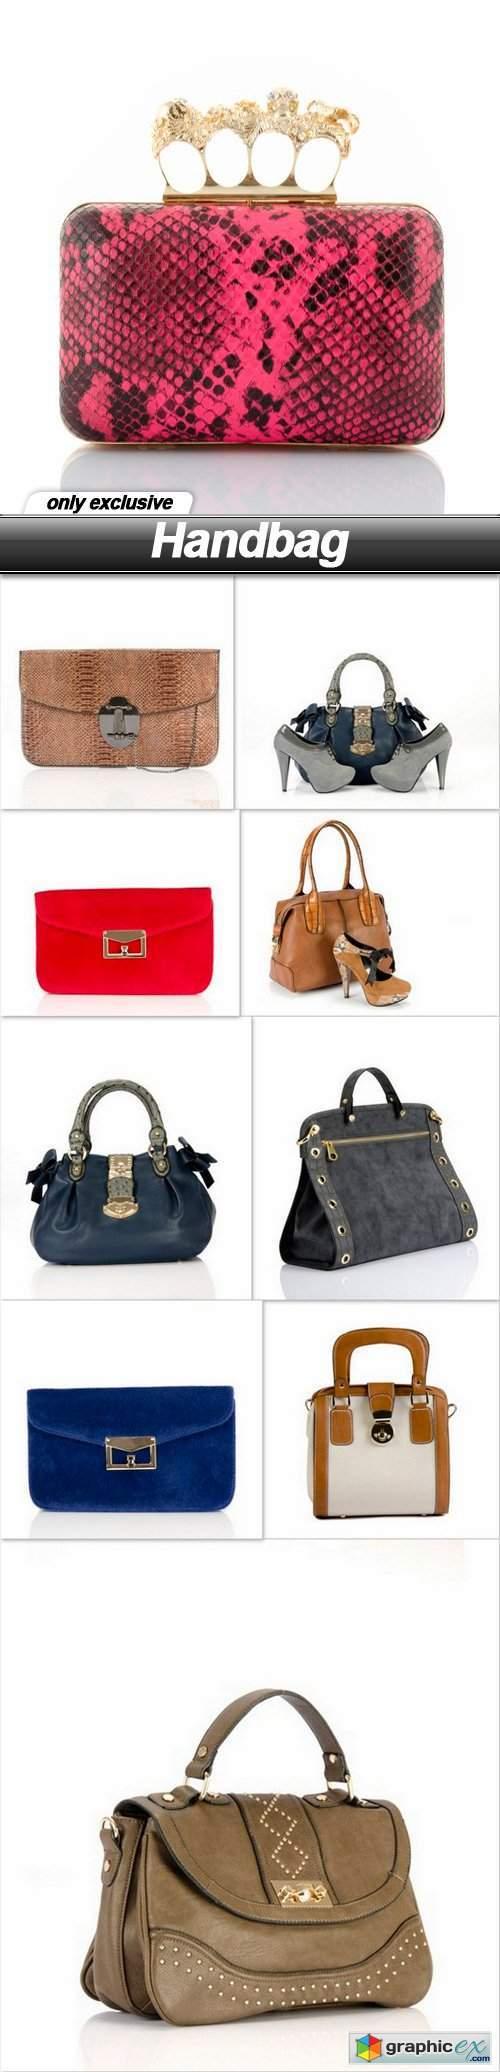 Handbag - 10 UHQ JPEG